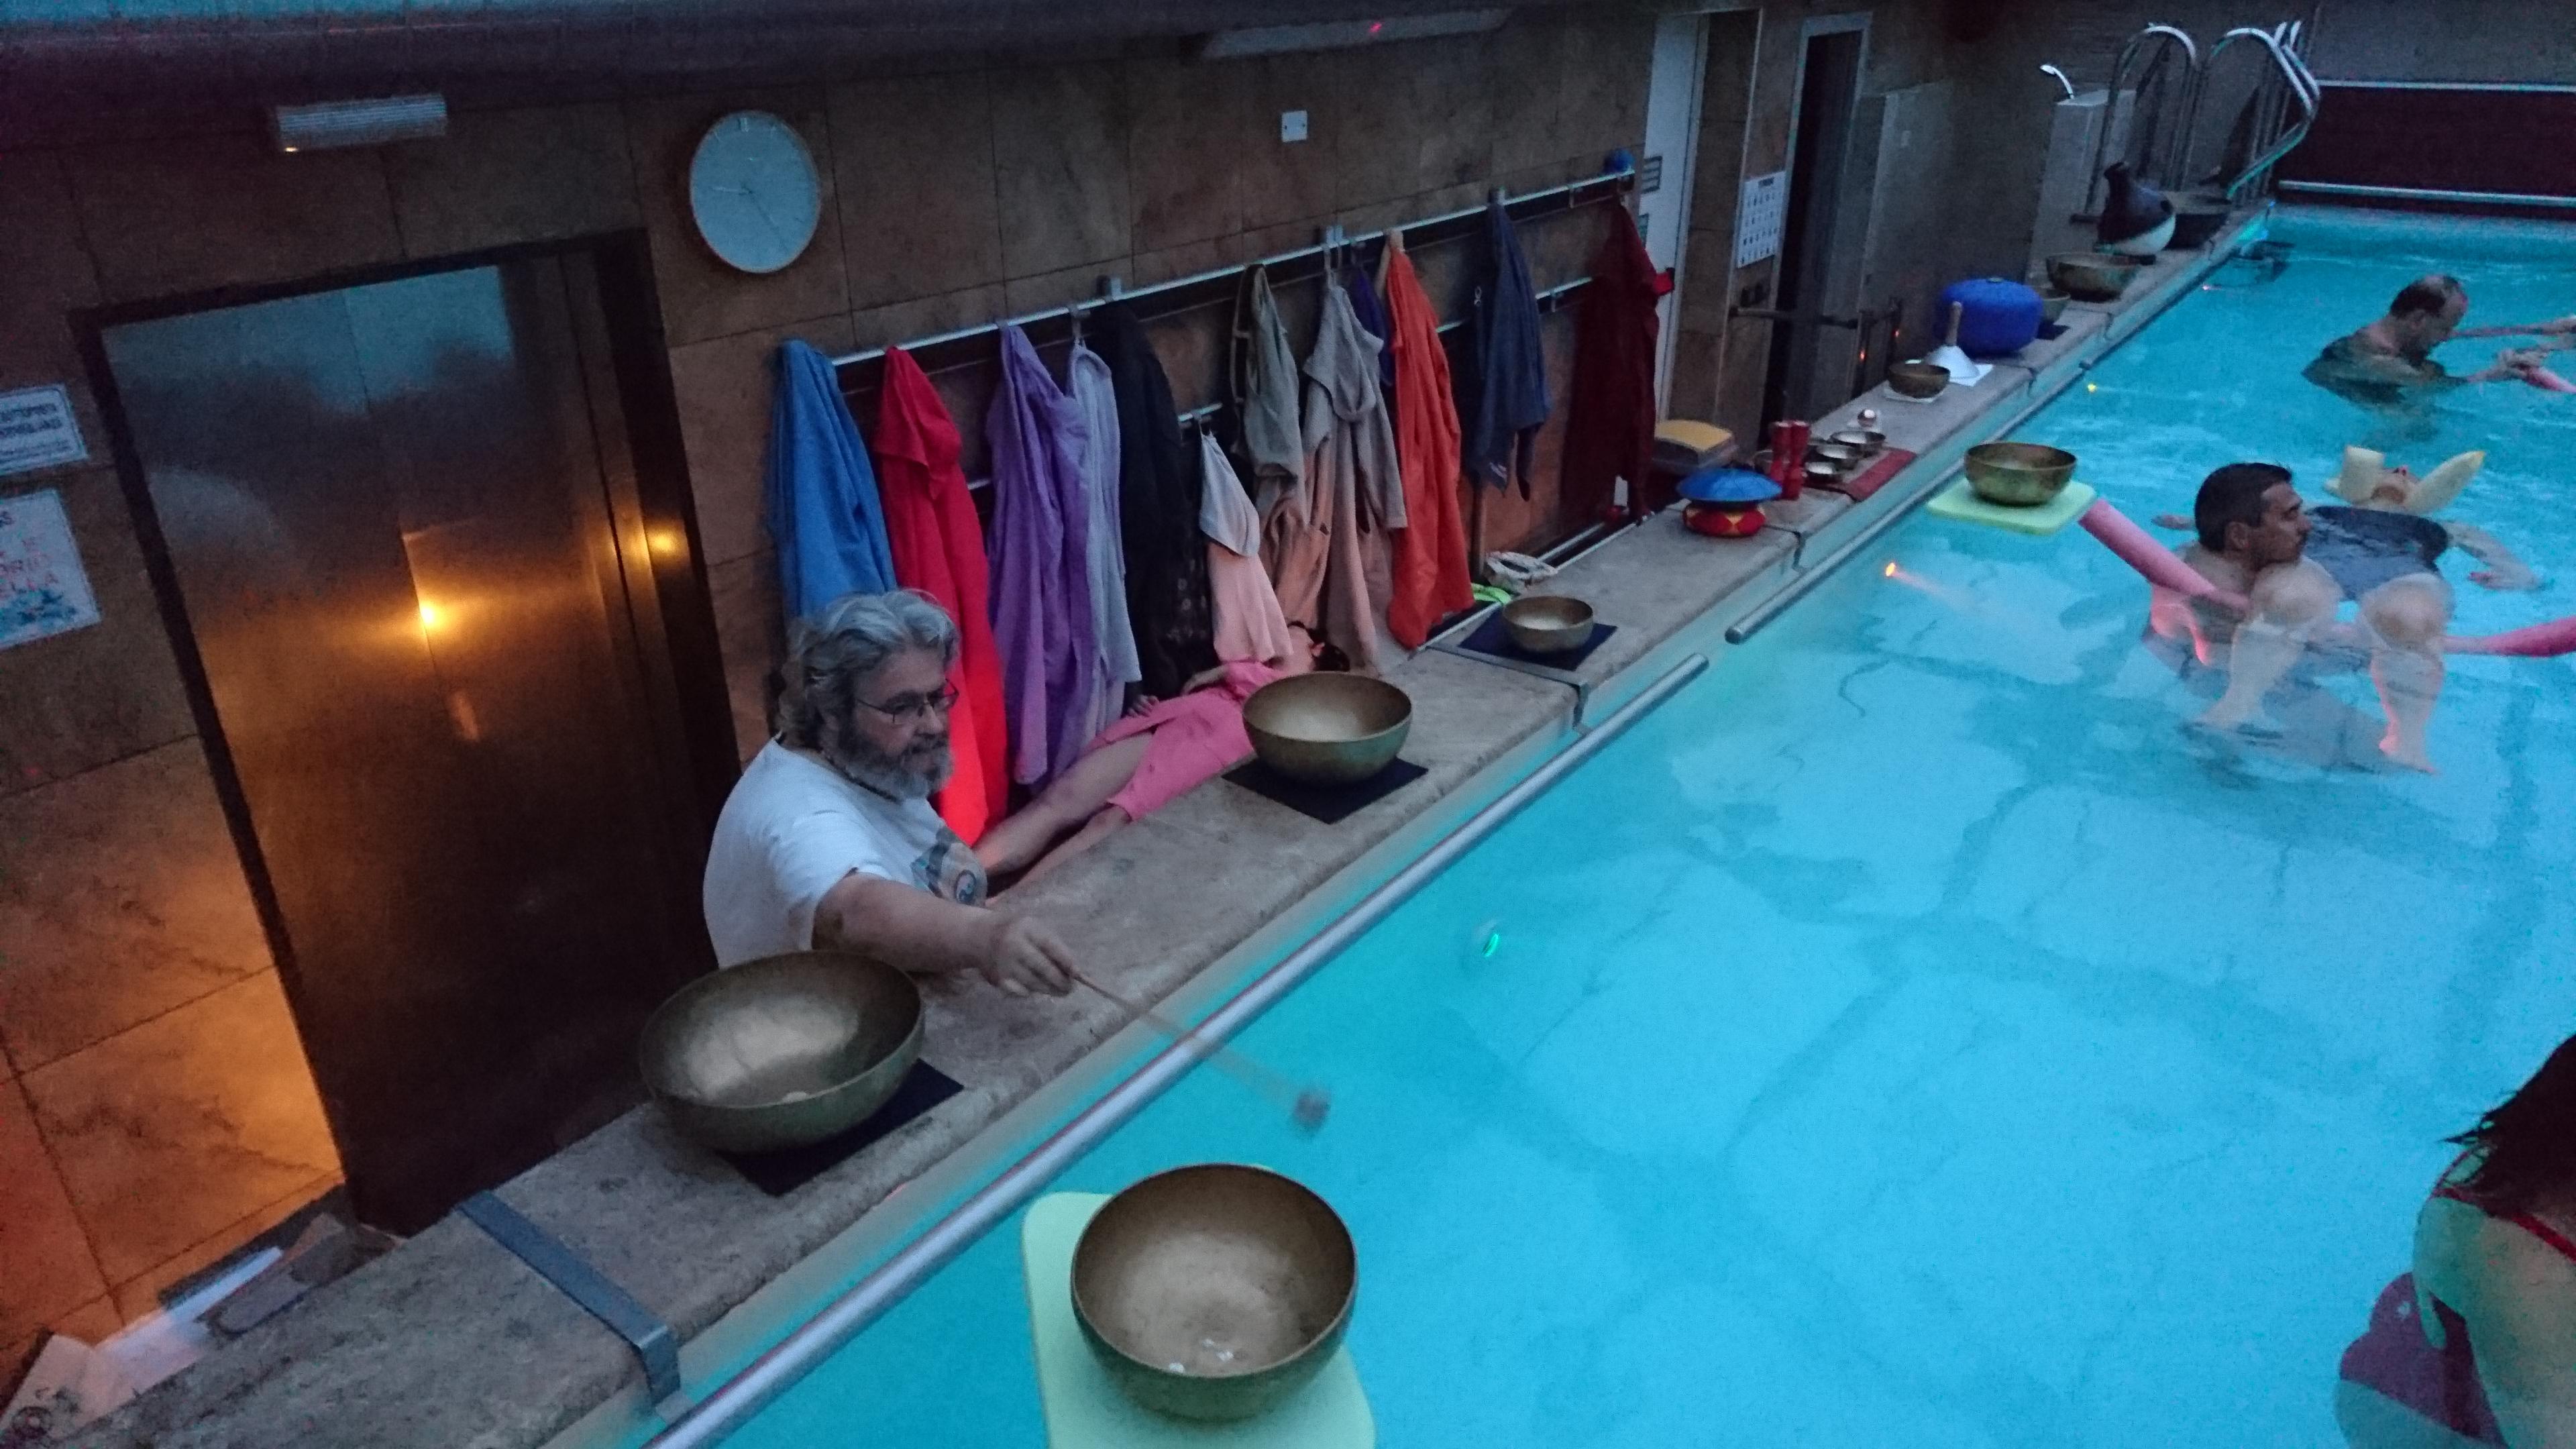 Bagno Armonico in piscina 3